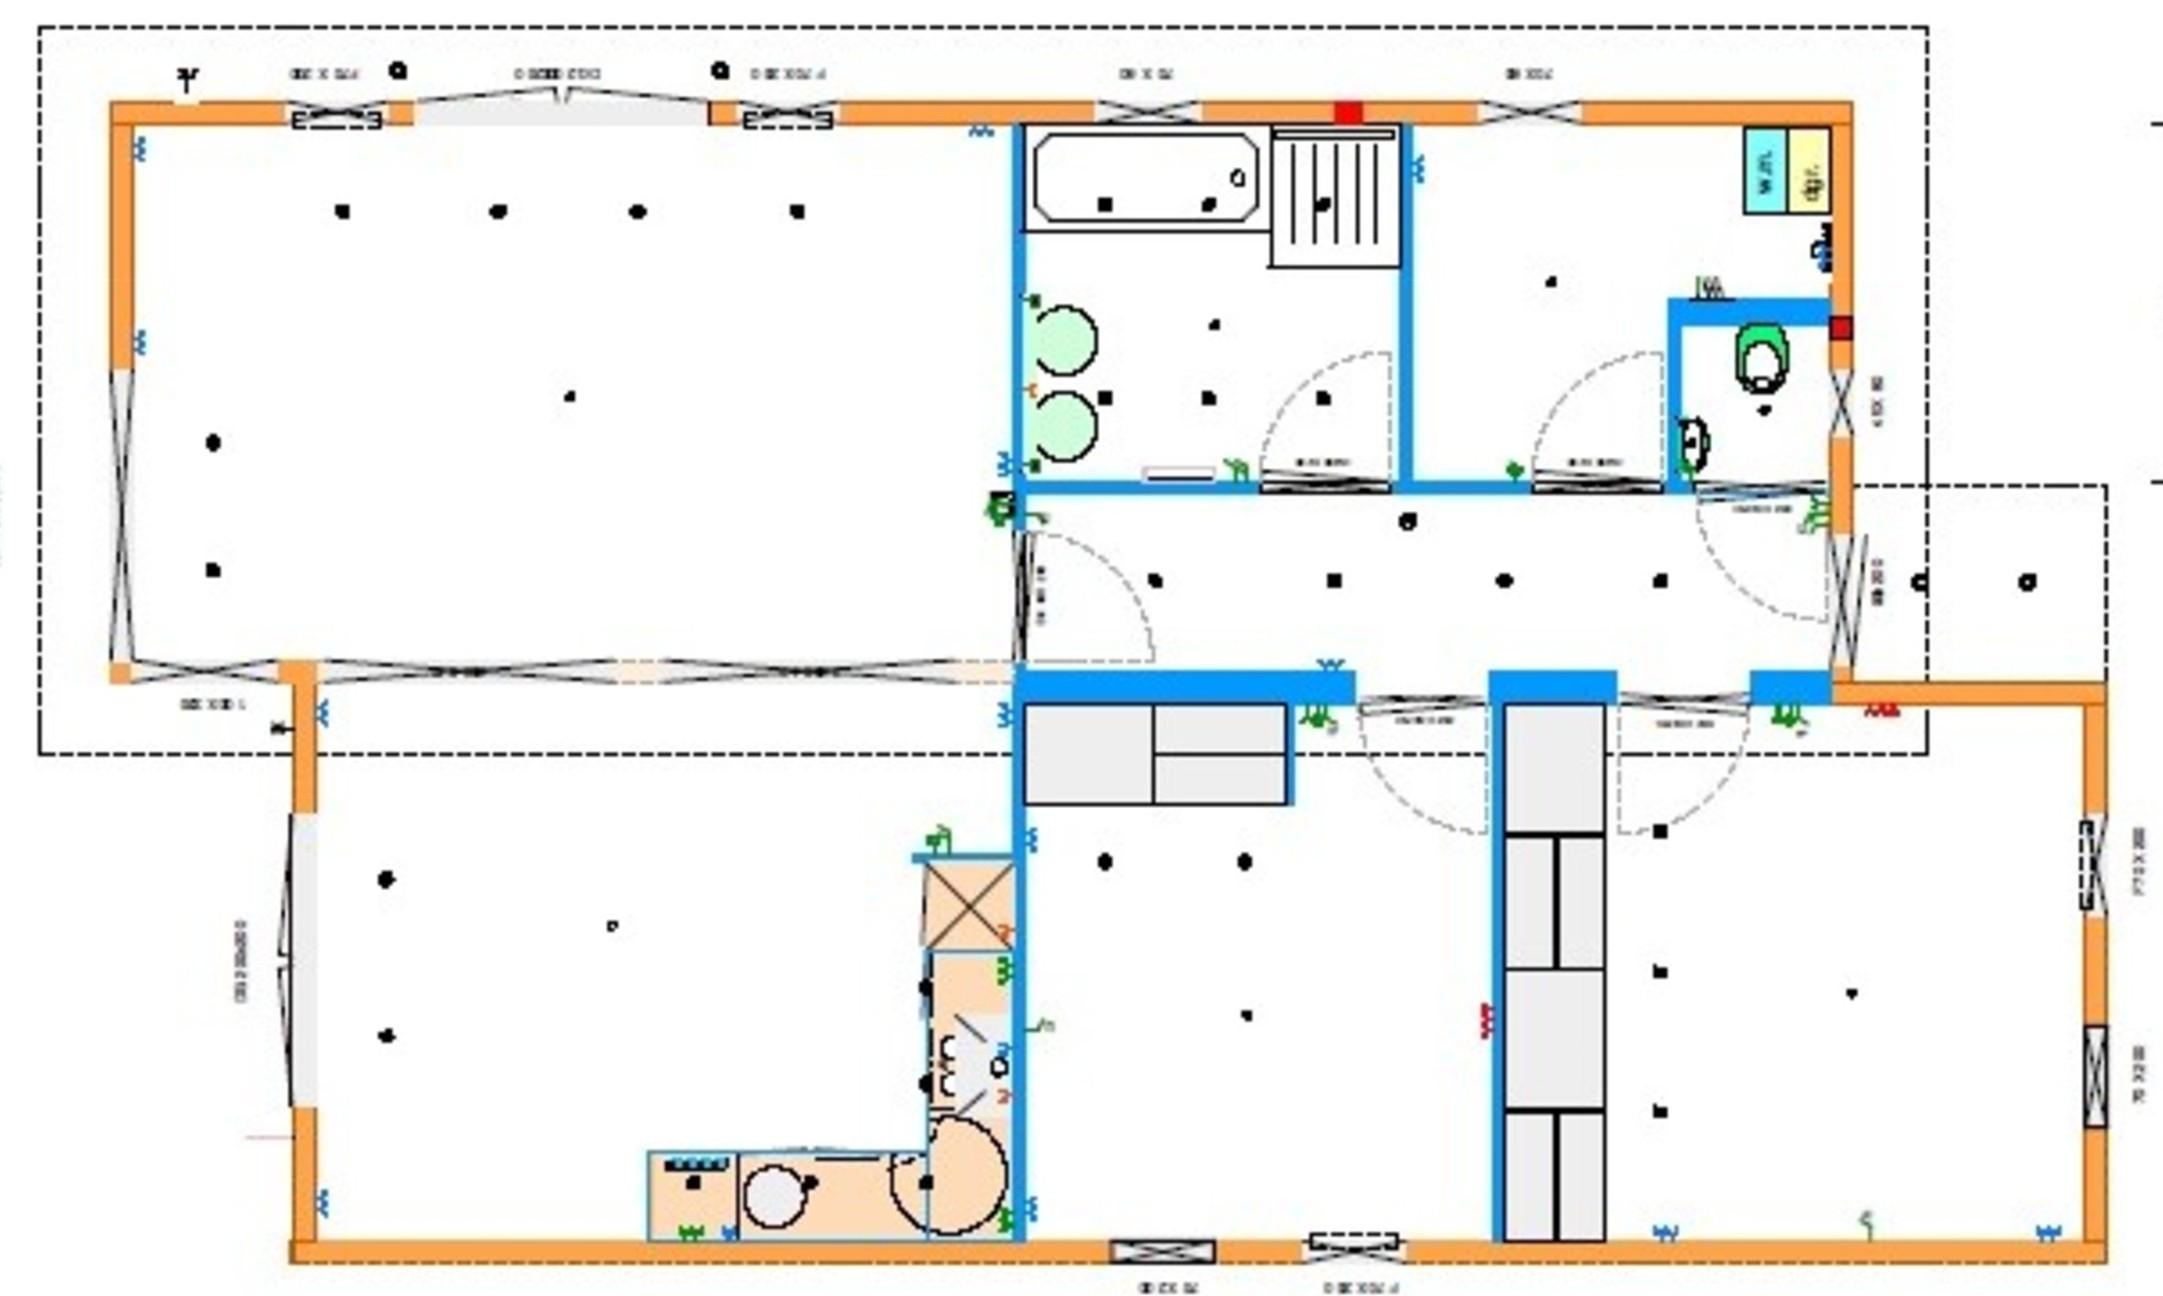 Grundrissentwurf EcoSun 100 qm 8,00 x 9,30/8,70 m